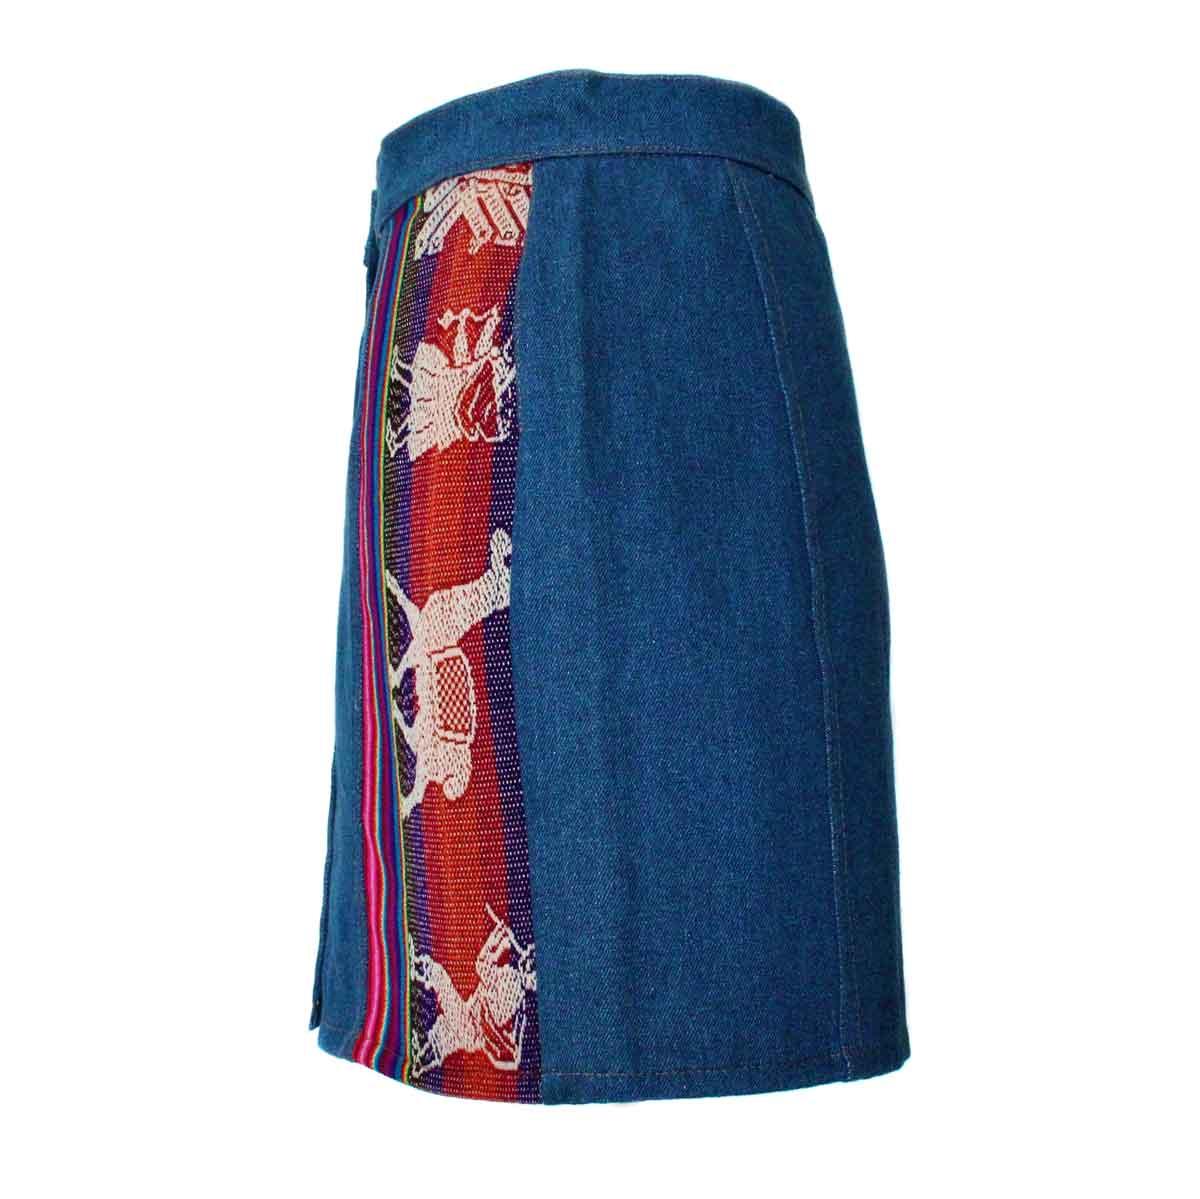 Inka-Products-Mini-jupe Femme Denim Bleu Jean-Tissu Traditionnel Andin Coloré-2